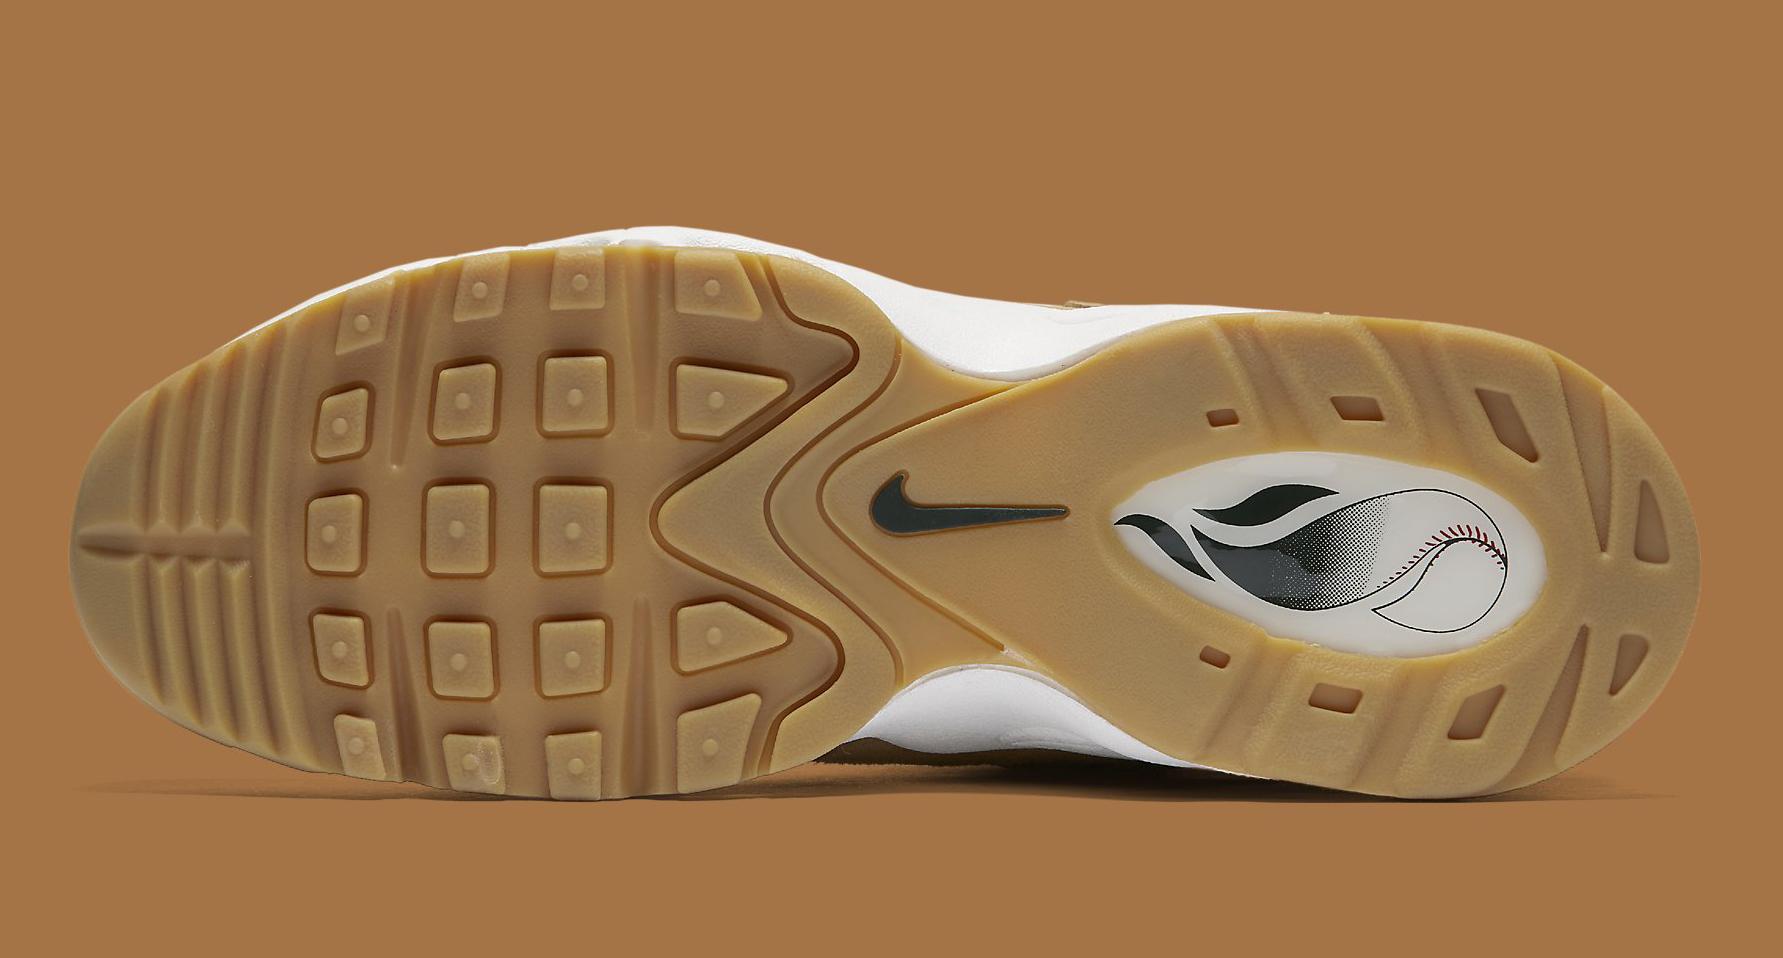 Wheat Nike Griffey Max 1 354912-200 Sole